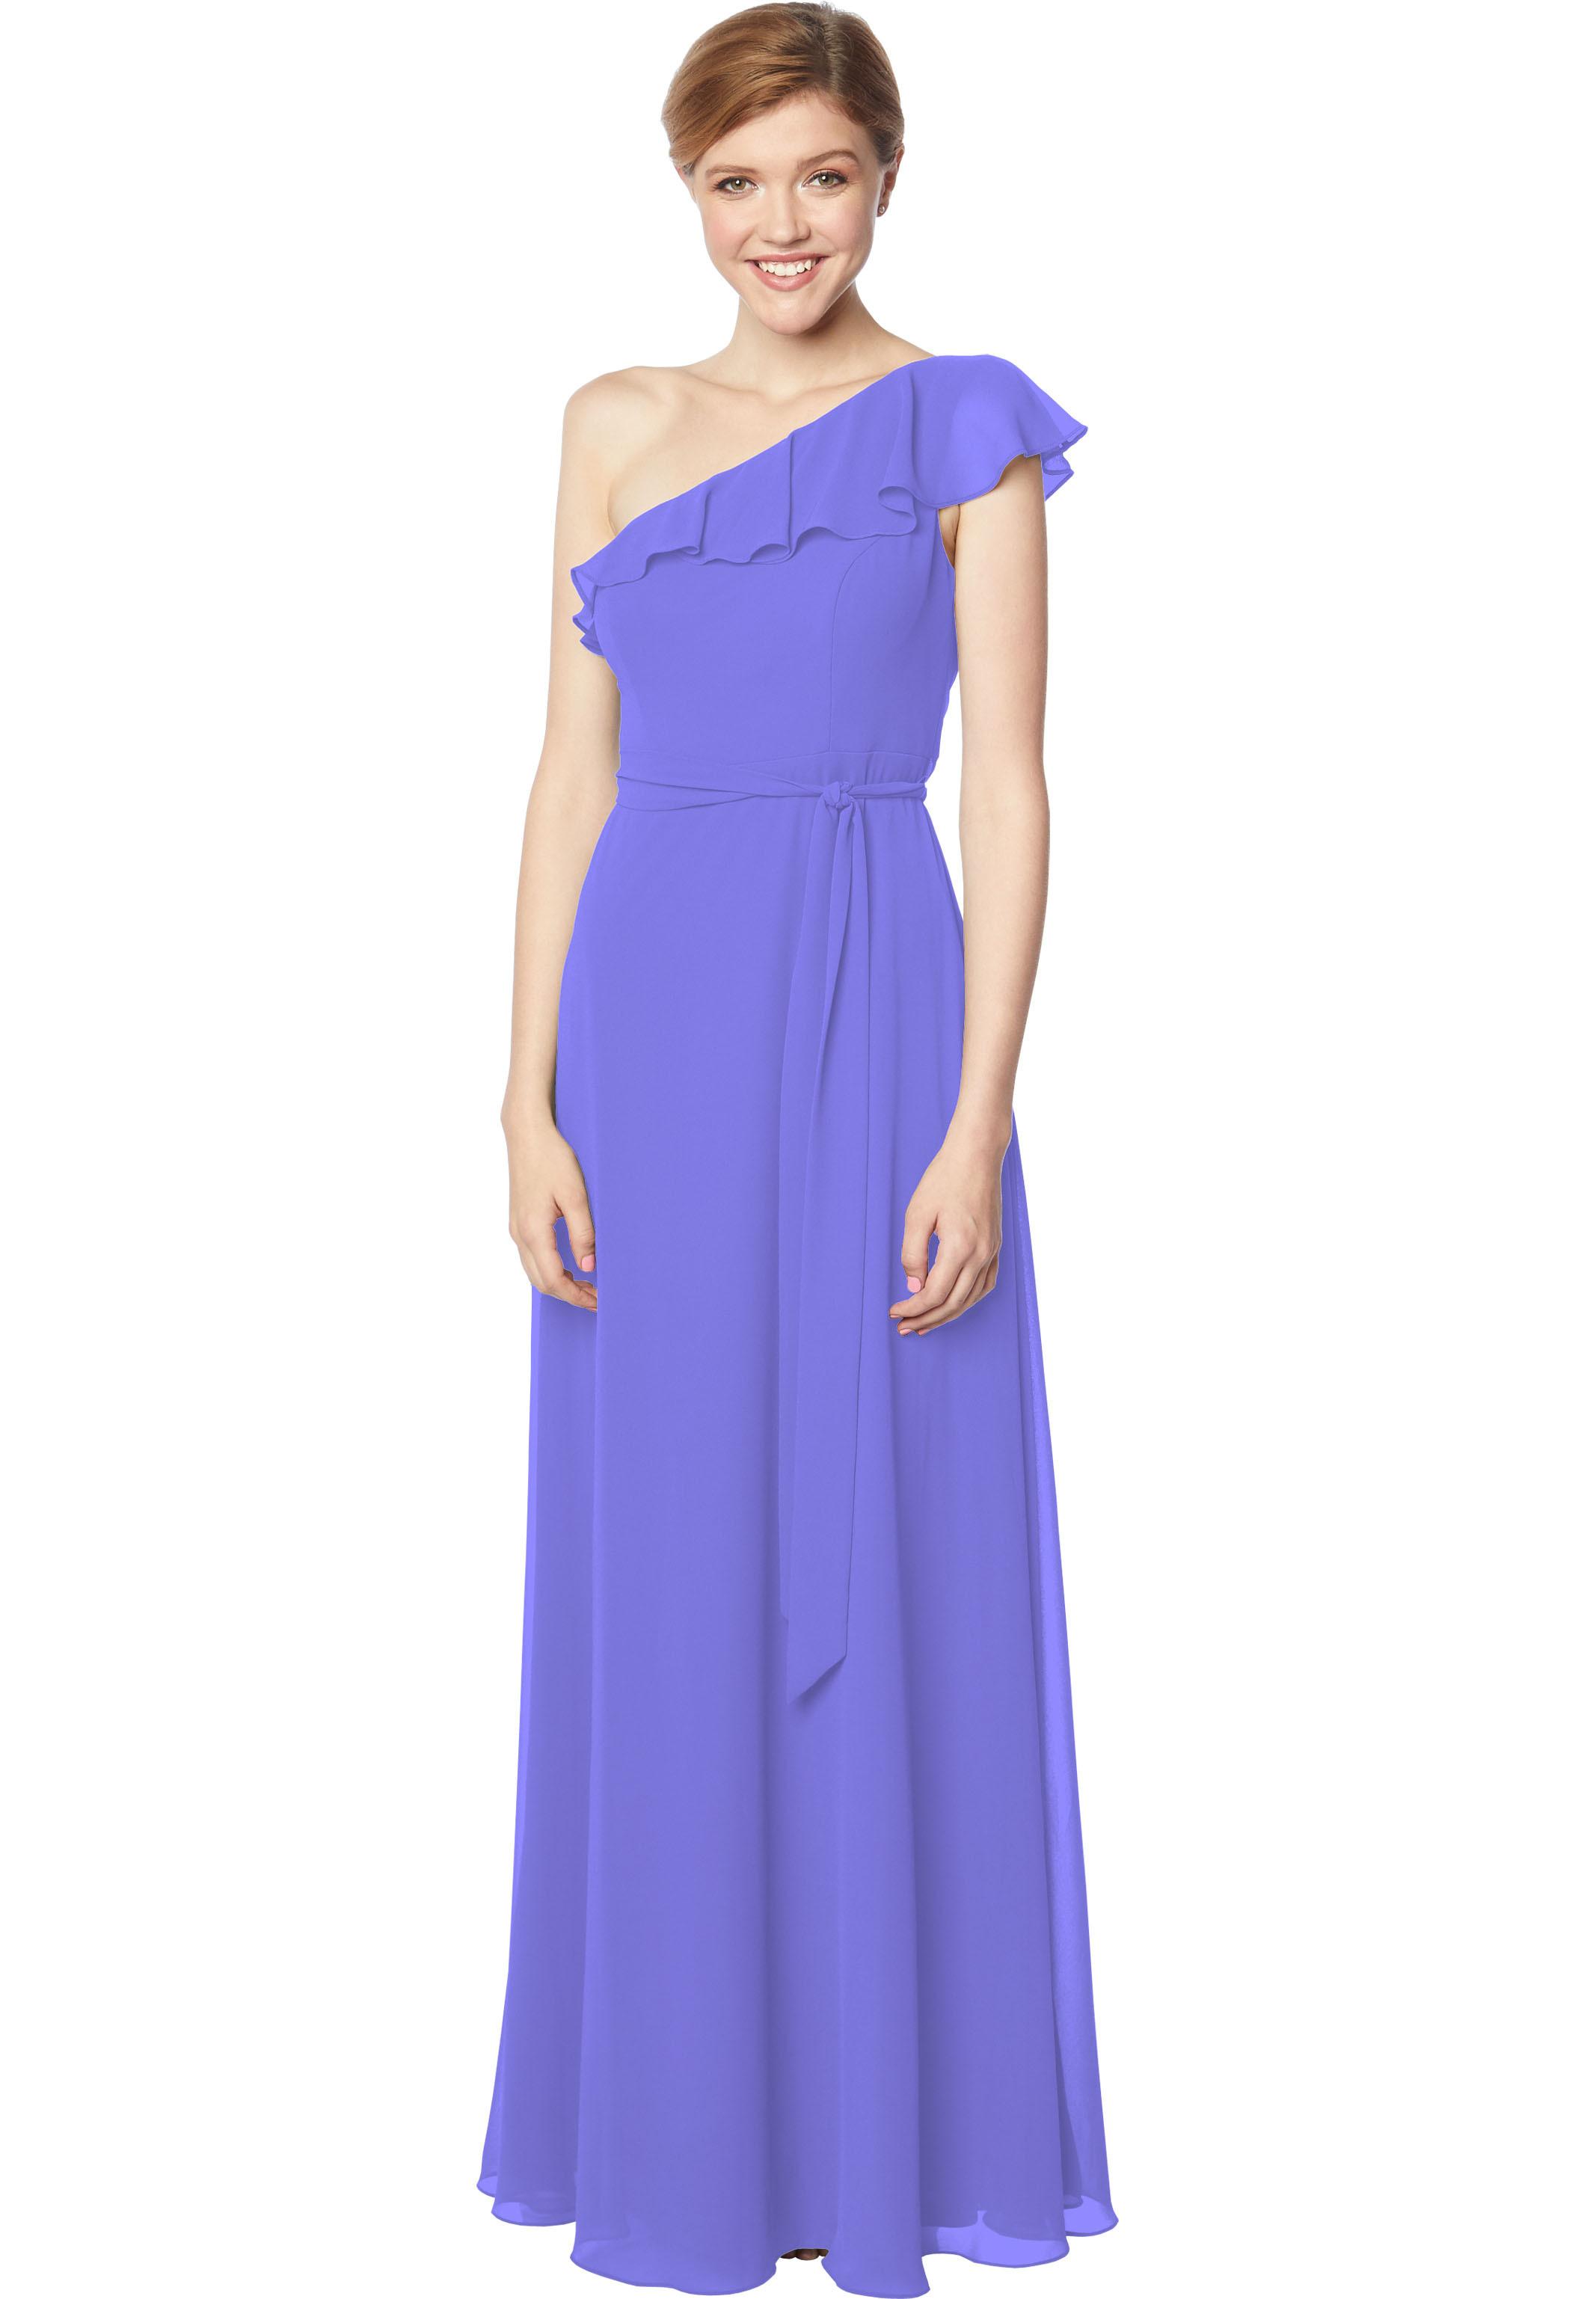 Bill Levkoff REGENCY Chiffon One Shoulder A-line gown, $178.00 Front